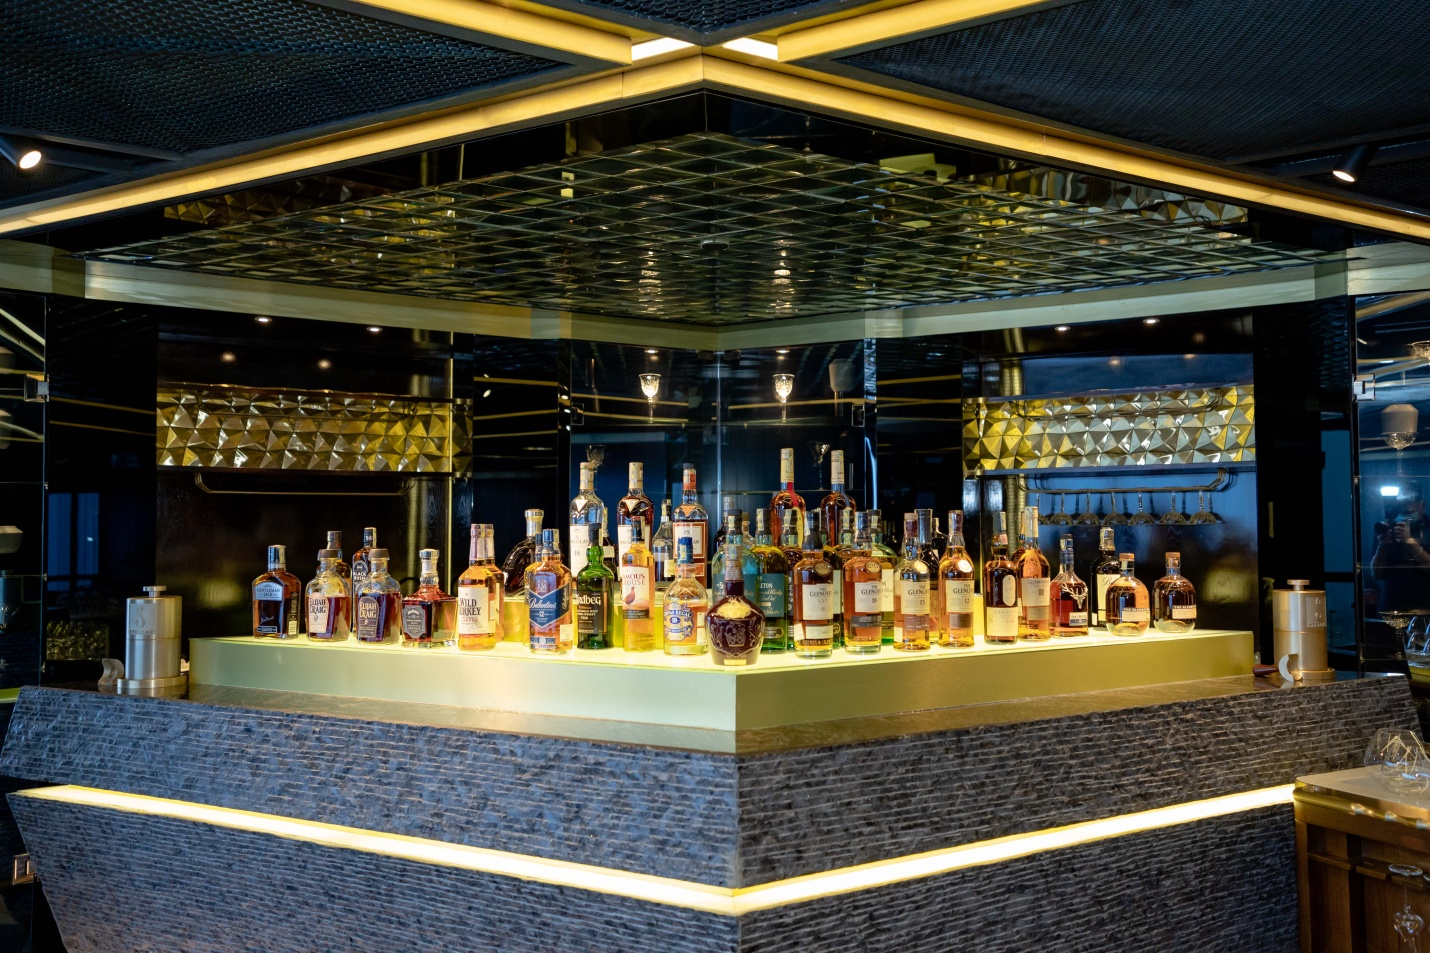 Hanoi 5-star hotel wine and spirit collection